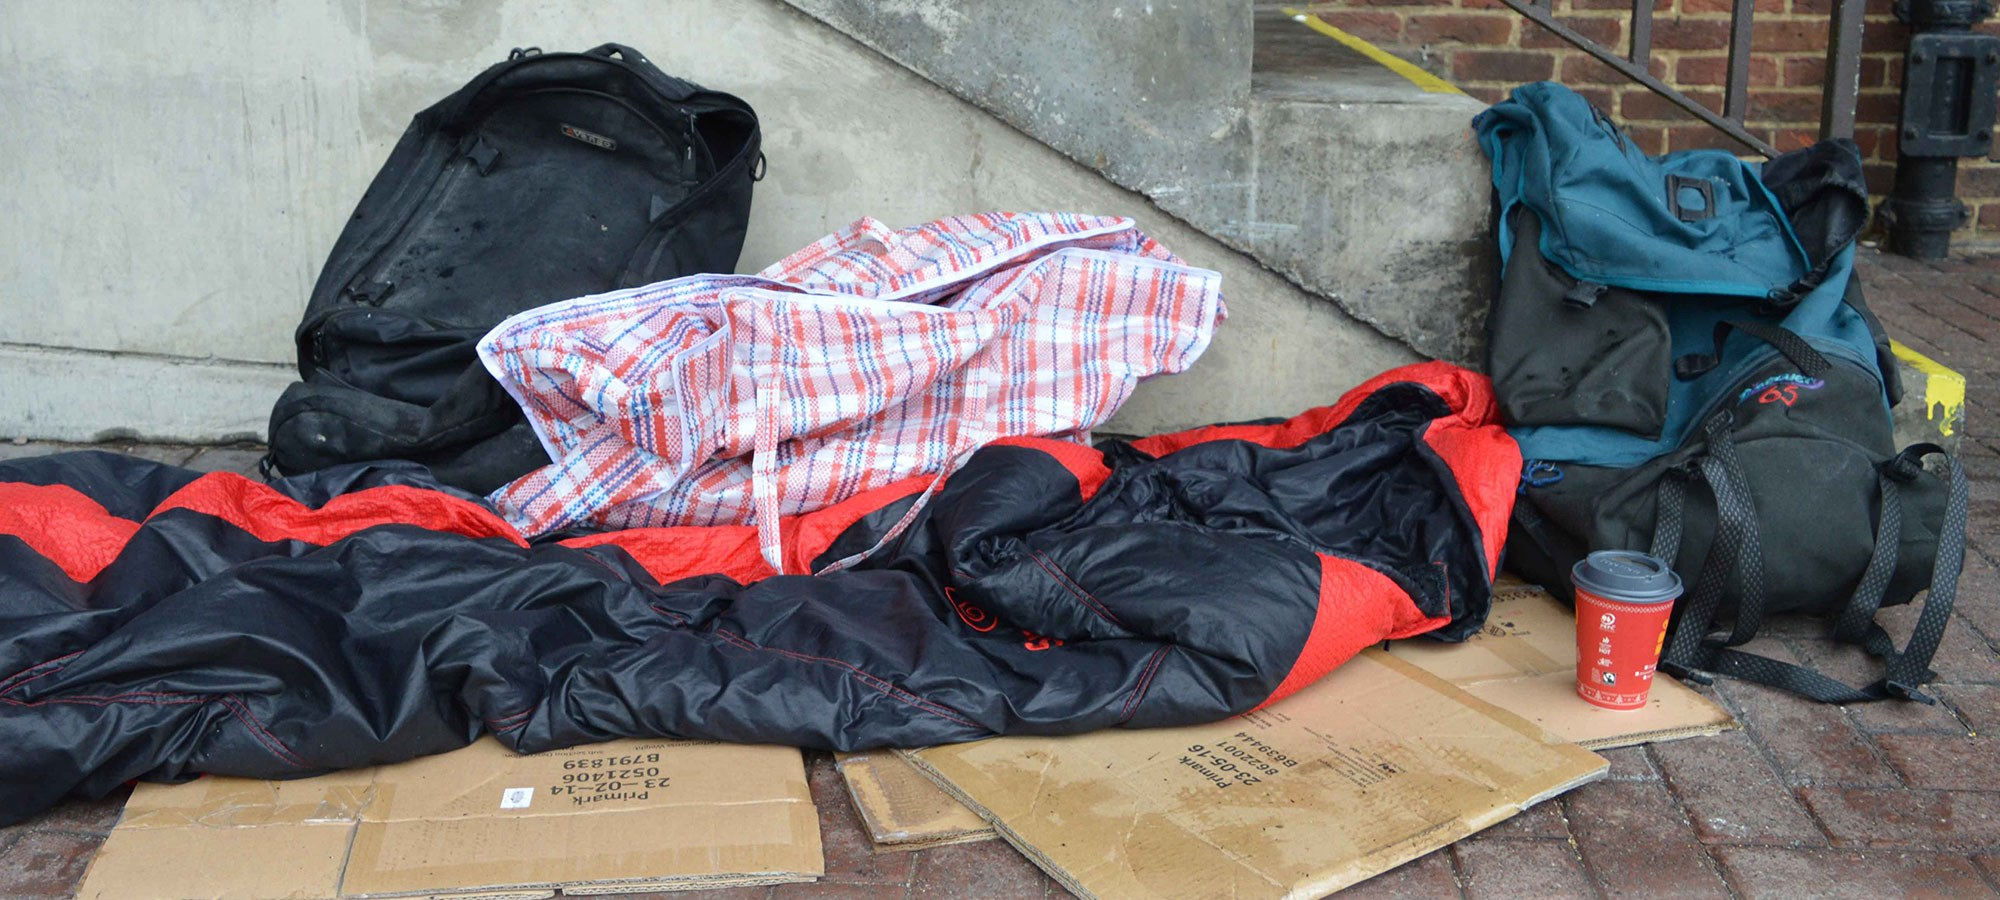 Sleeping-bag_191107_155136.jpg